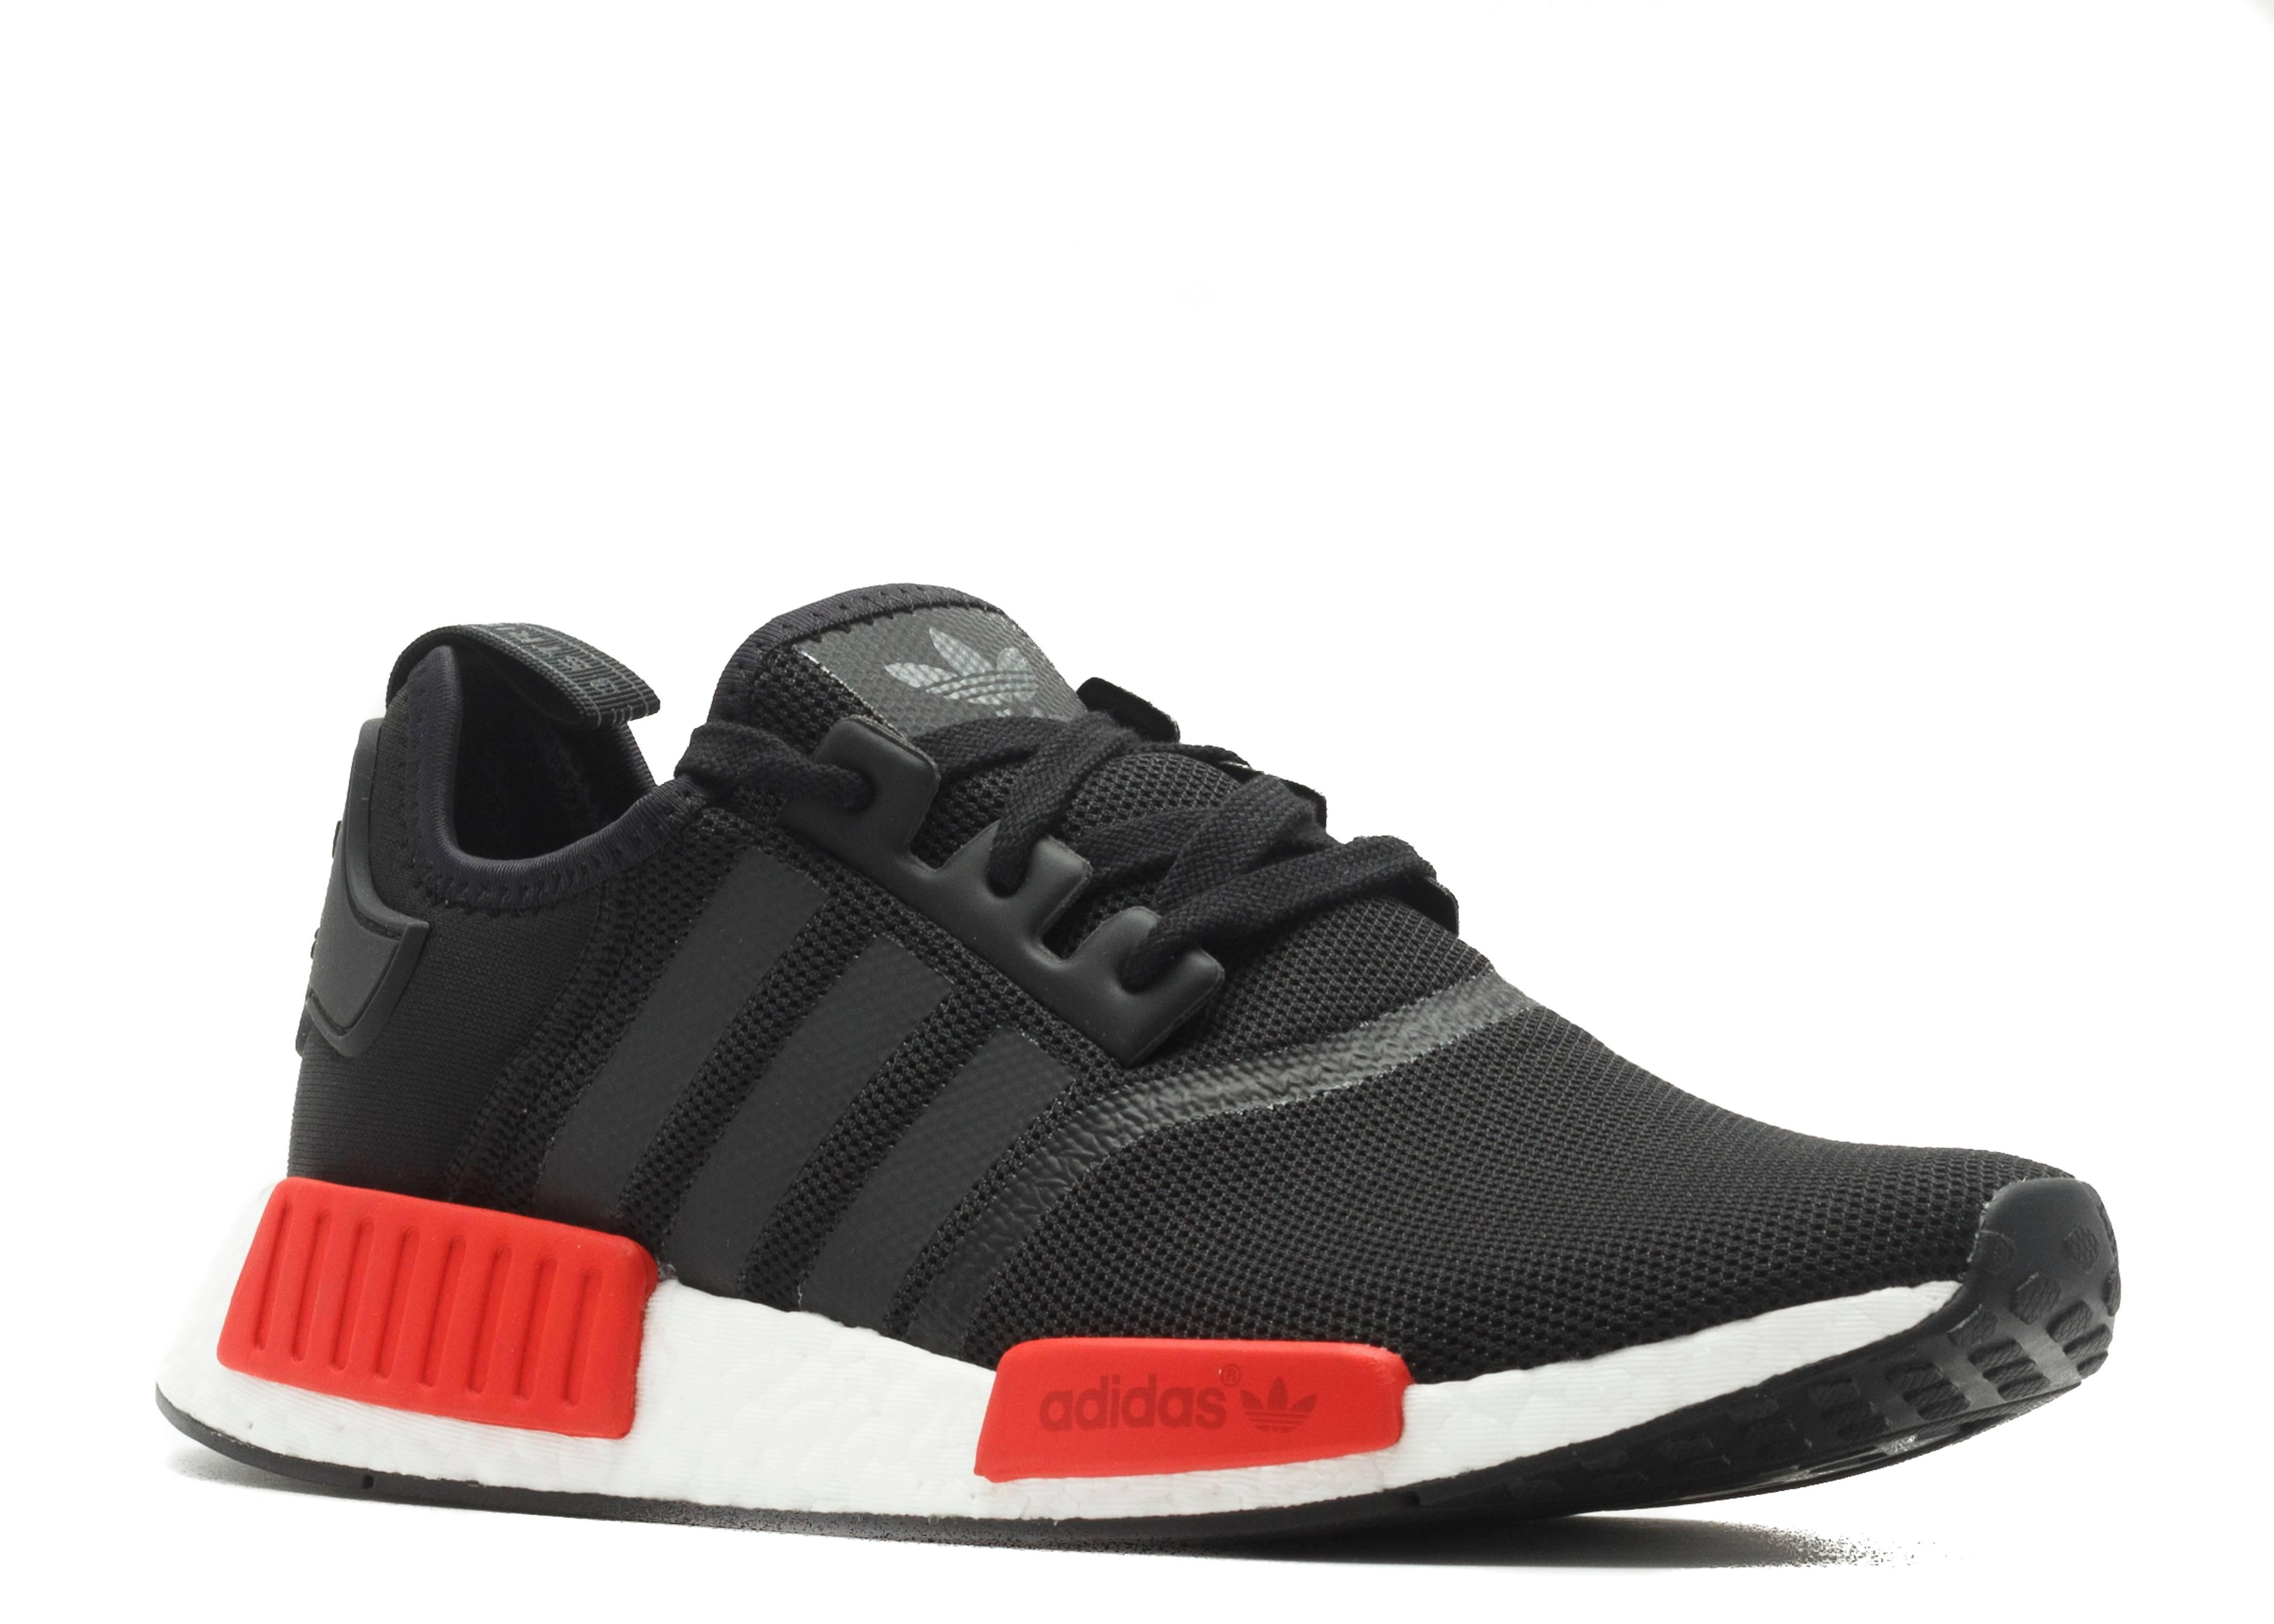 adidas nmd black grey white red